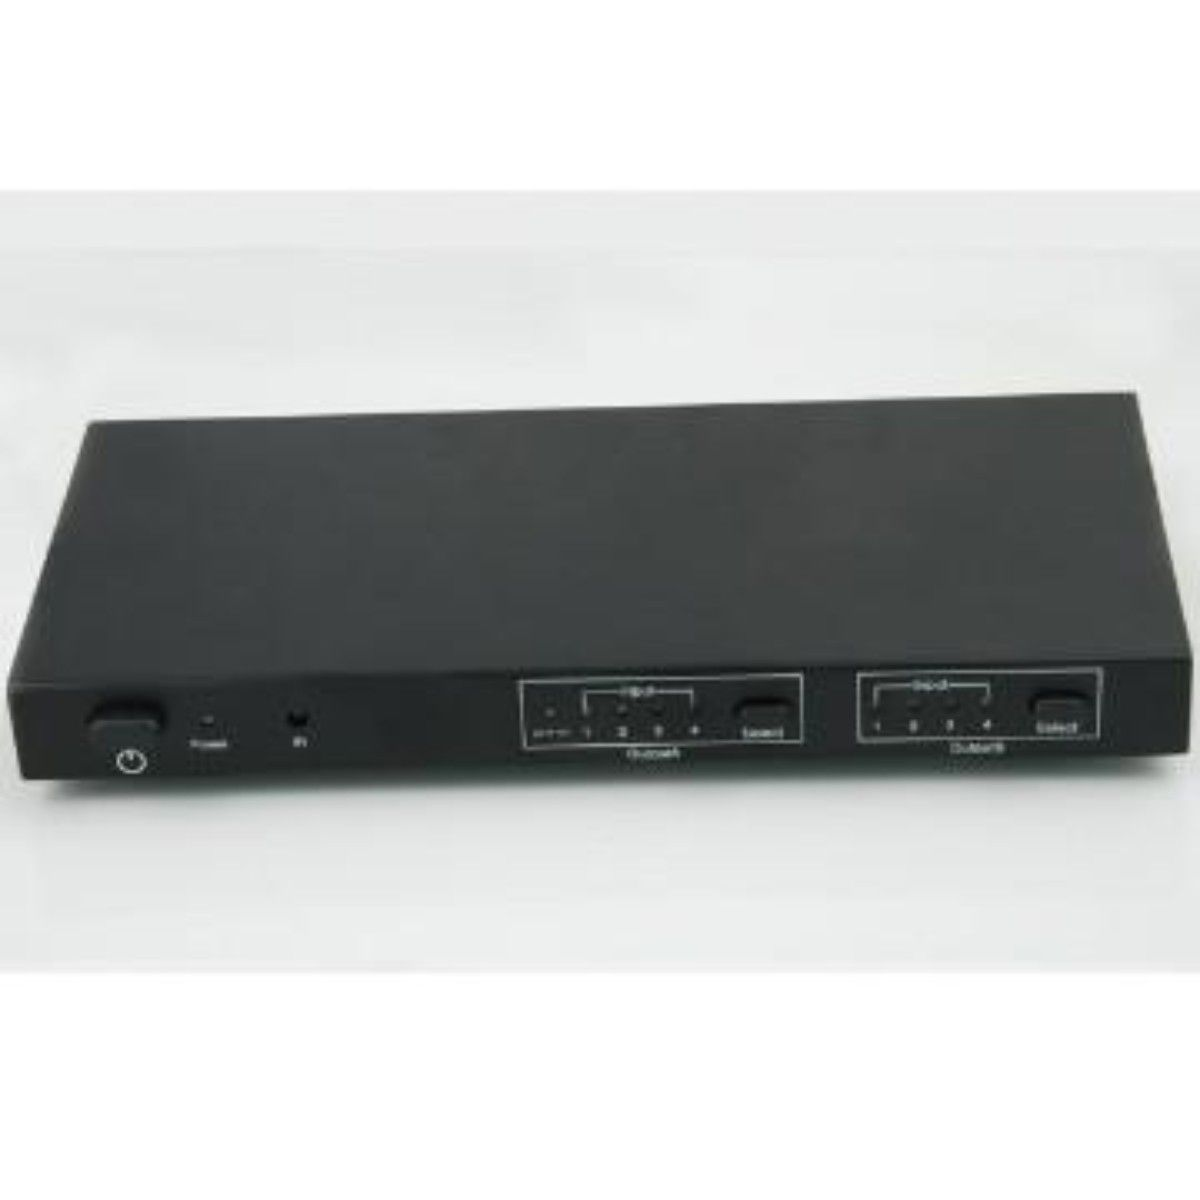 HDMI Switcher Matrix 8x8 4k HD 8 Entradas 8 Saidas Controle